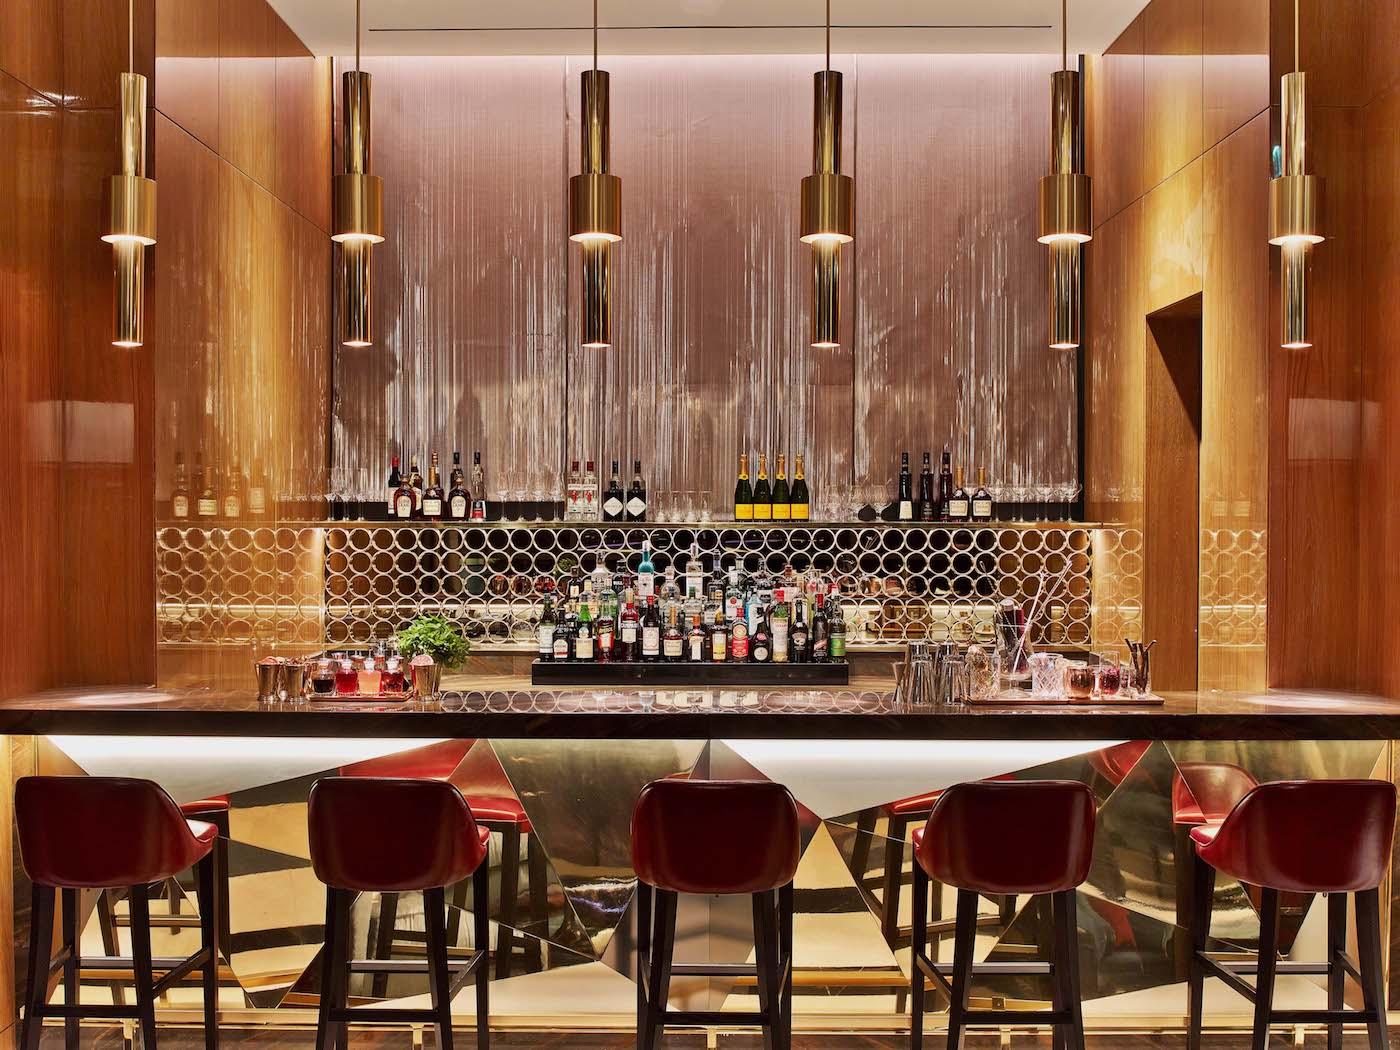 Four-Seasons-DIFC-Dubai-Woven-Metal-Glass-Lamination-Wall-Covering-Hanging-Panels-Sophie-Mallebranche-Paris